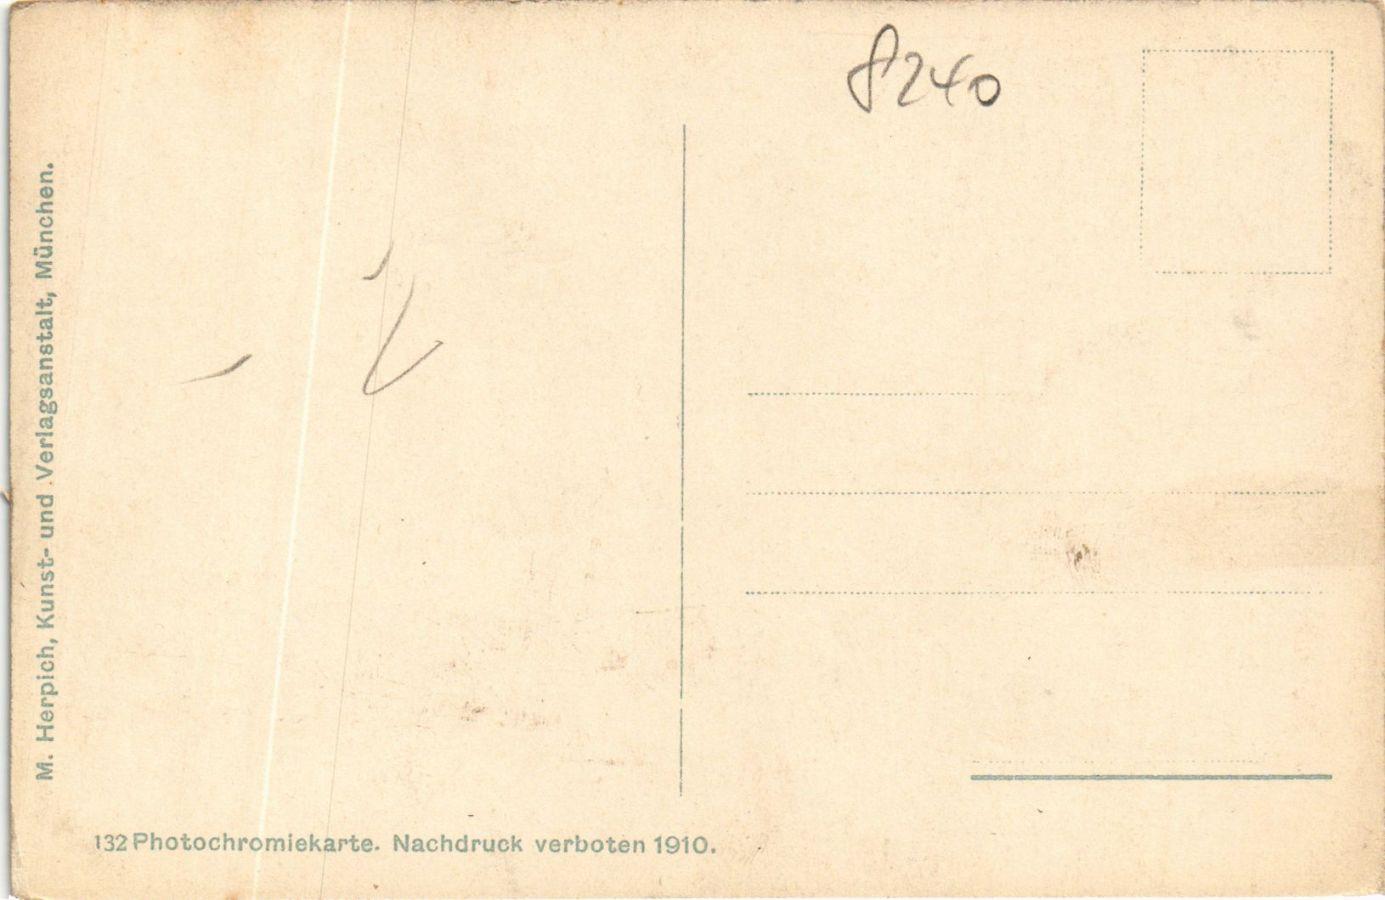 CPA-AK-Konigssee-vom-Malerwinkel-GERMANY-878800 miniature 2